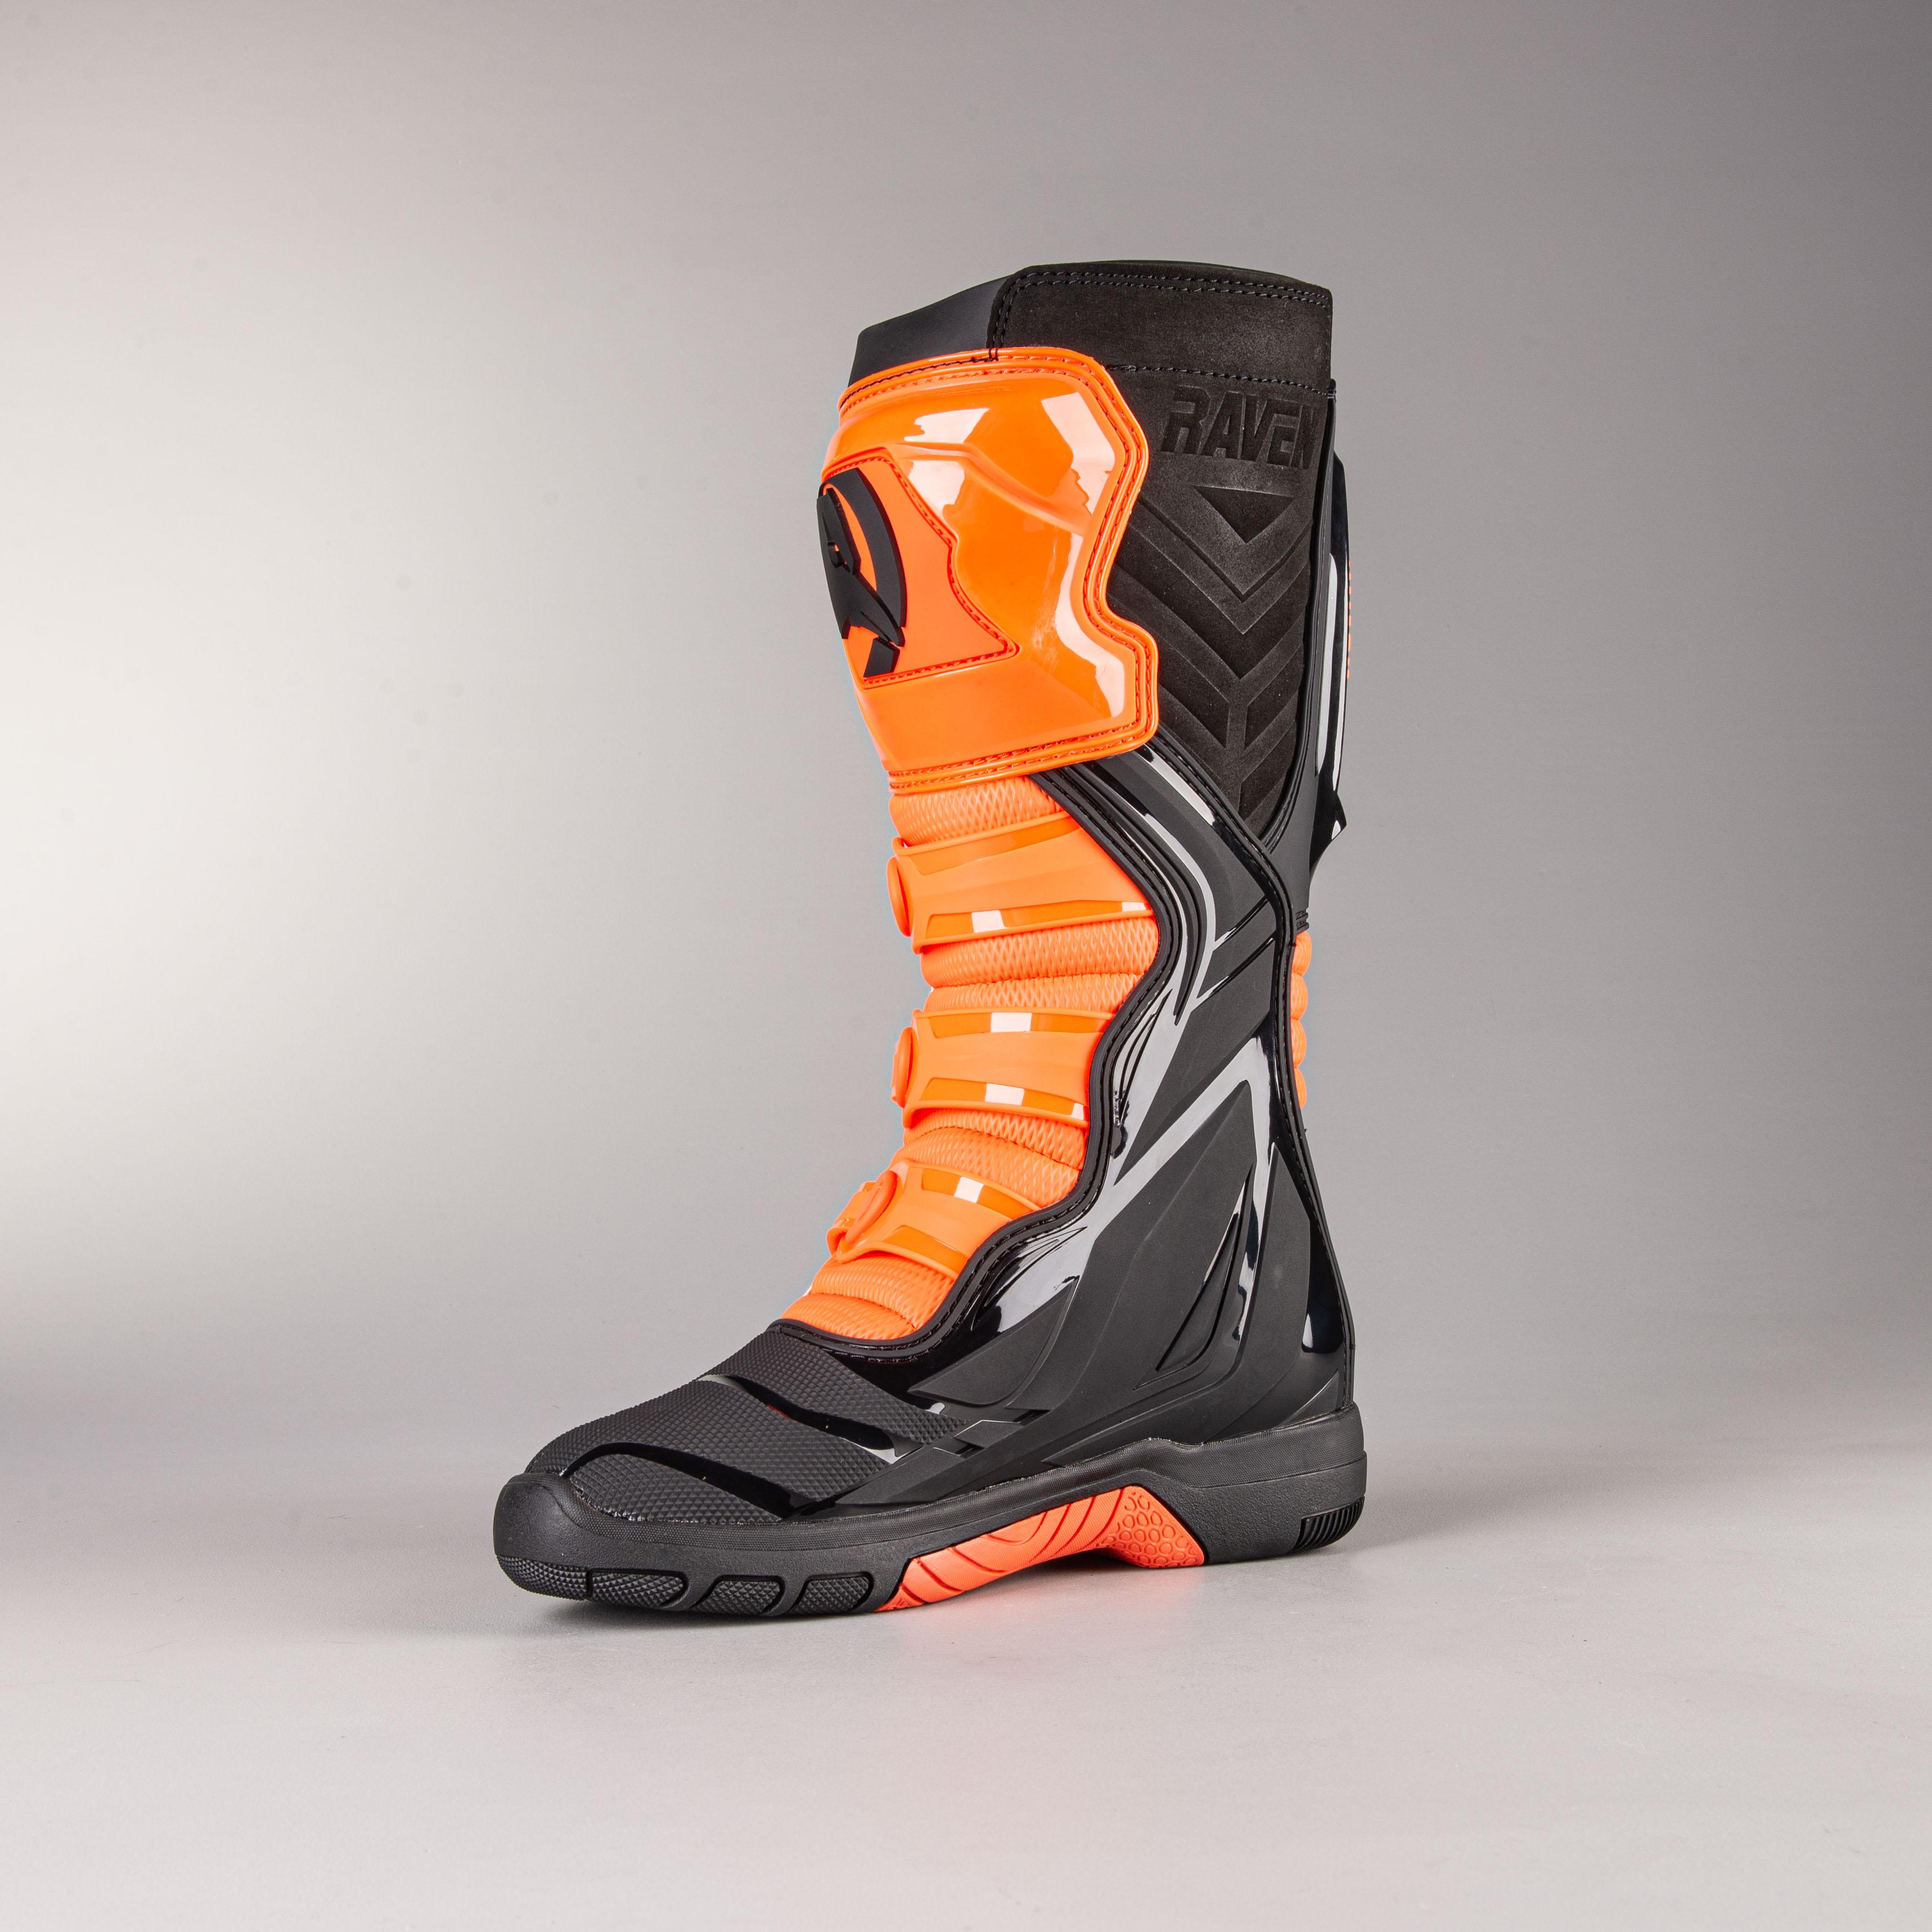 Raven Commander MX Boots Black-Orange